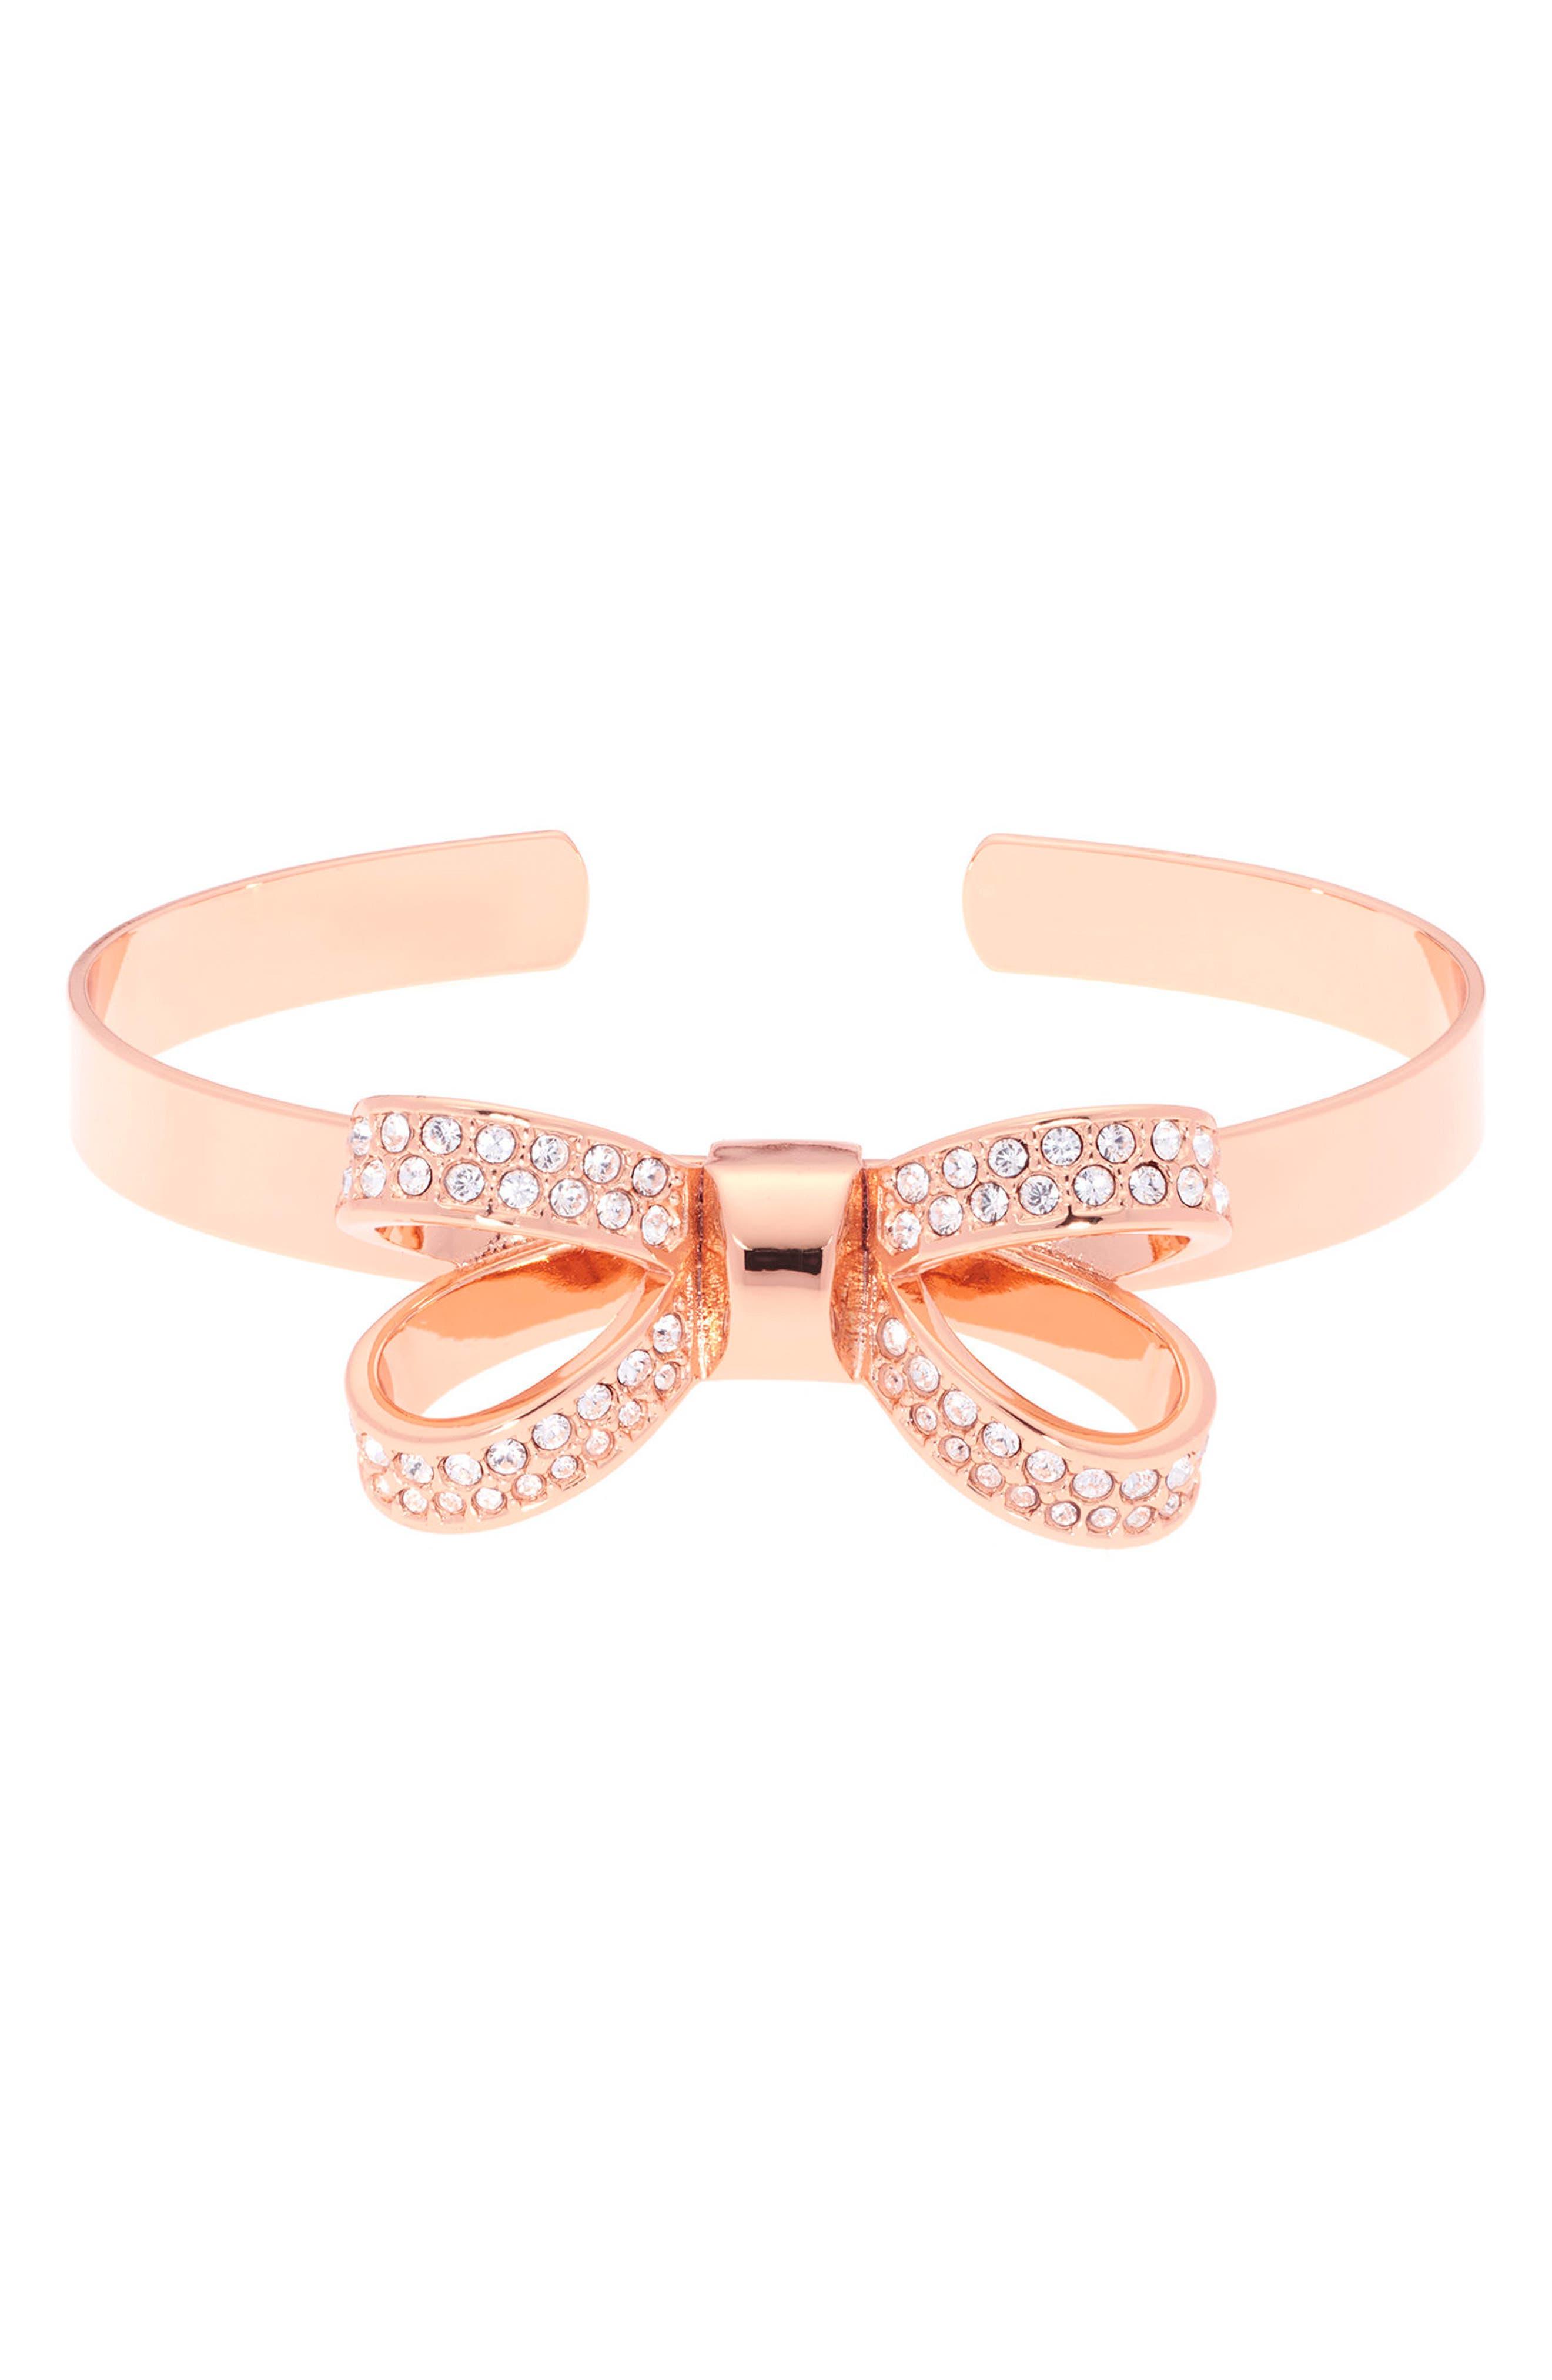 Ted Baker London Opulent Pavé Bow Cuff Bracelet